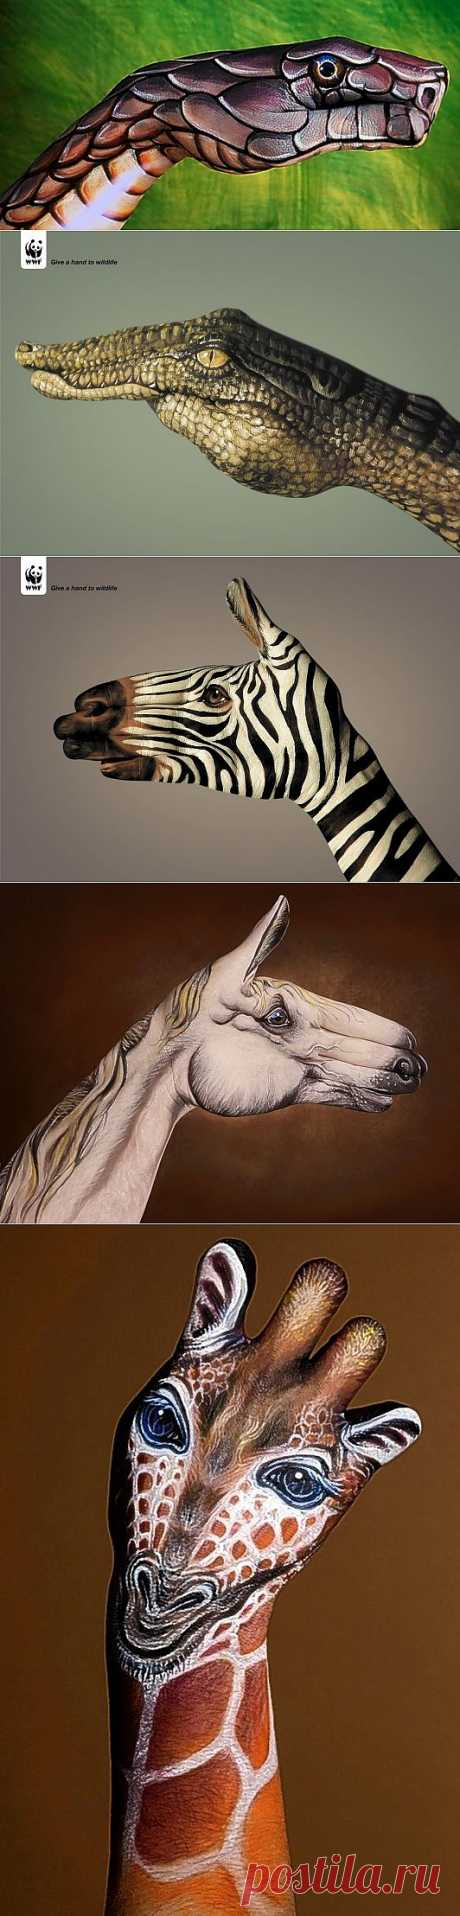 Hand Art – впечатляющие иллюстрации на руках от Guido Daniele   Newpix.ru - позитивный интернет-журнал